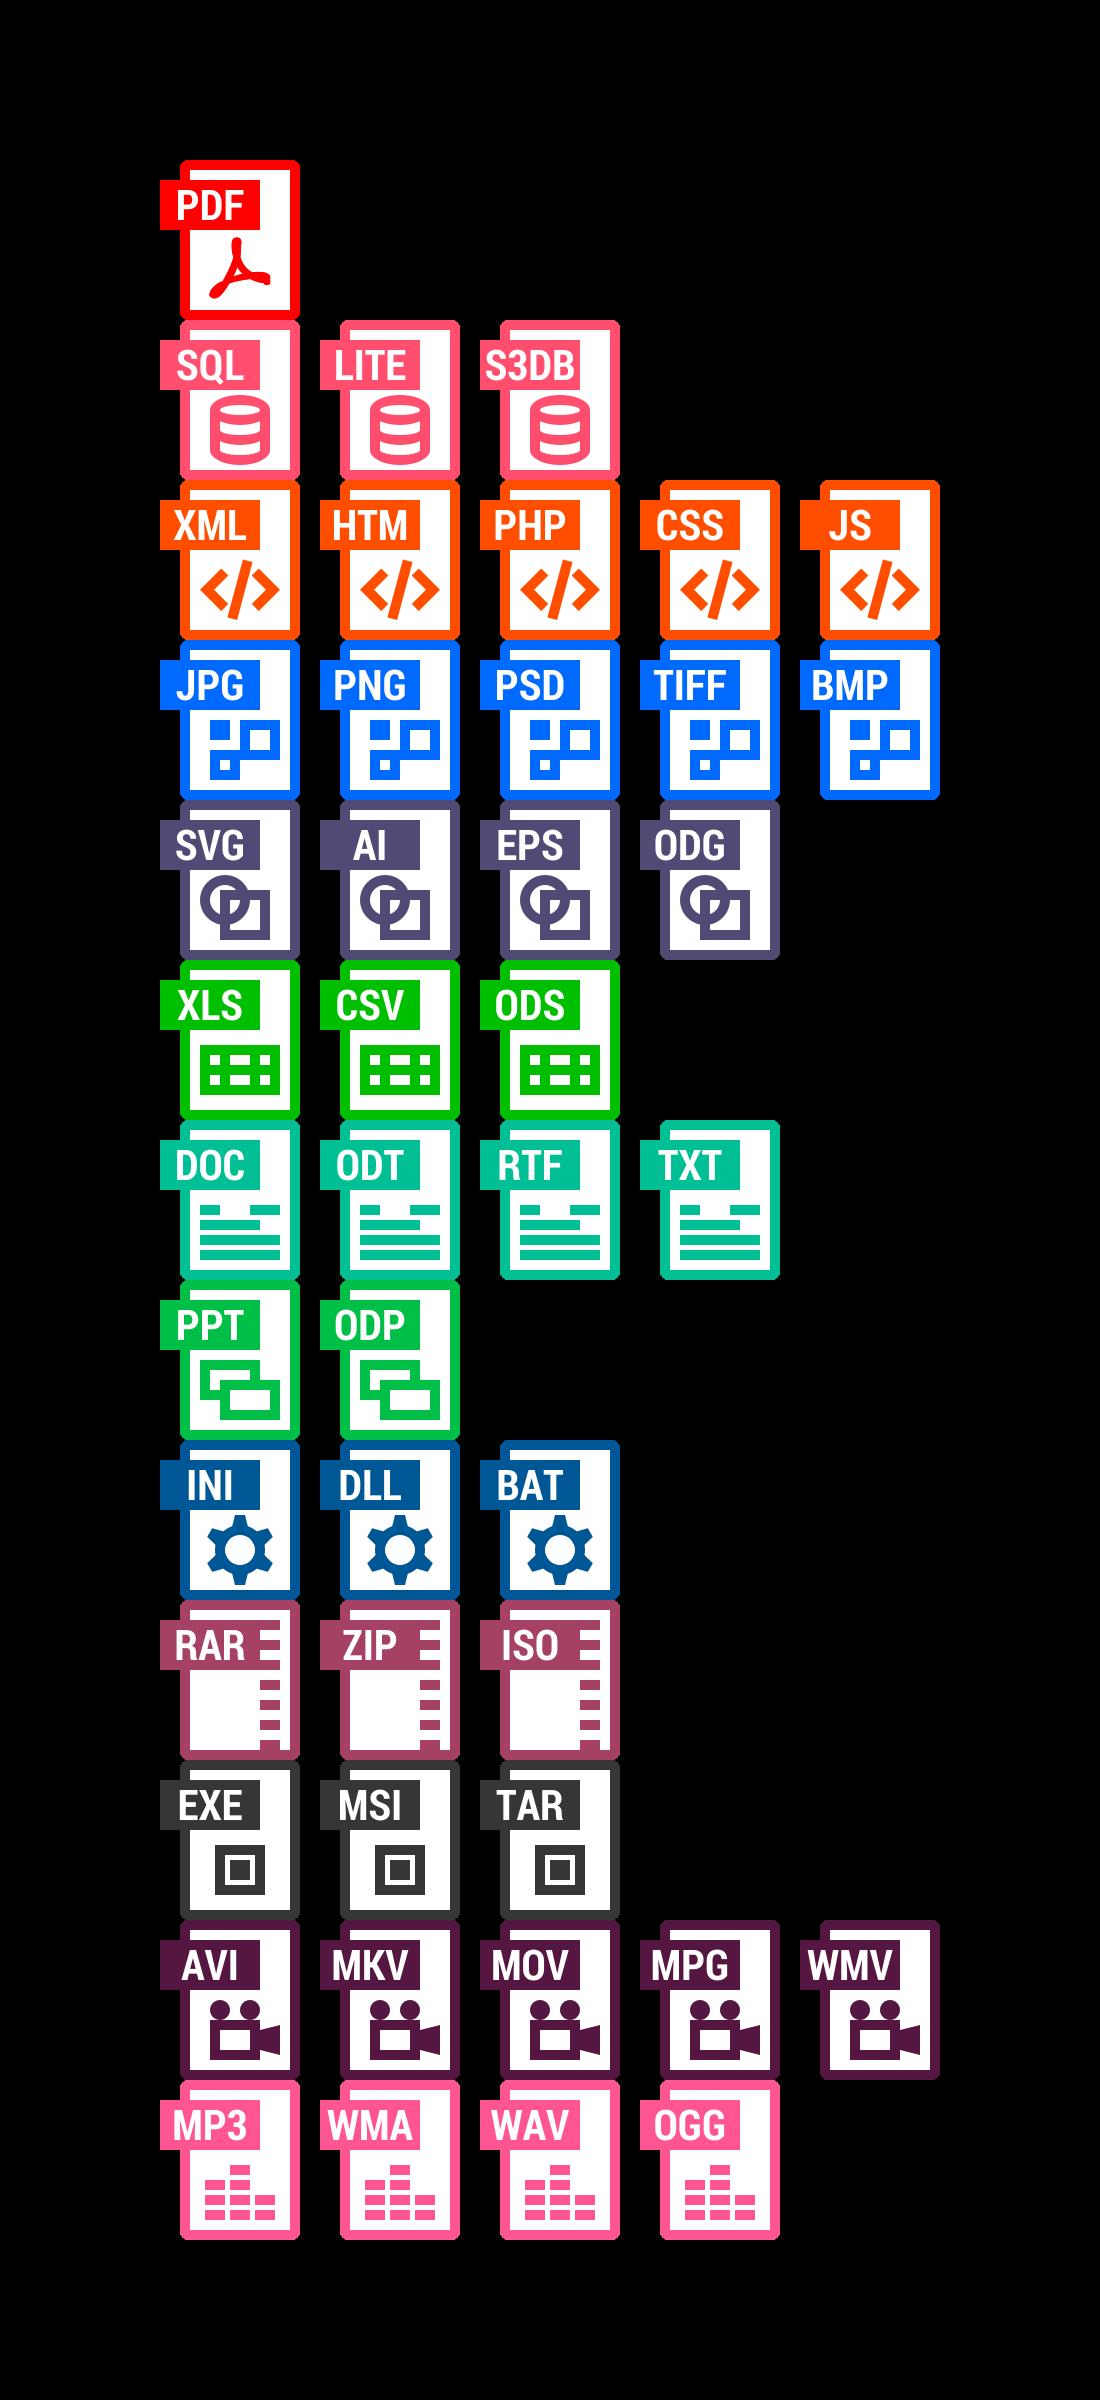 Free Windows 8 Cliparts, Download Free Clip Art, Free Clip.